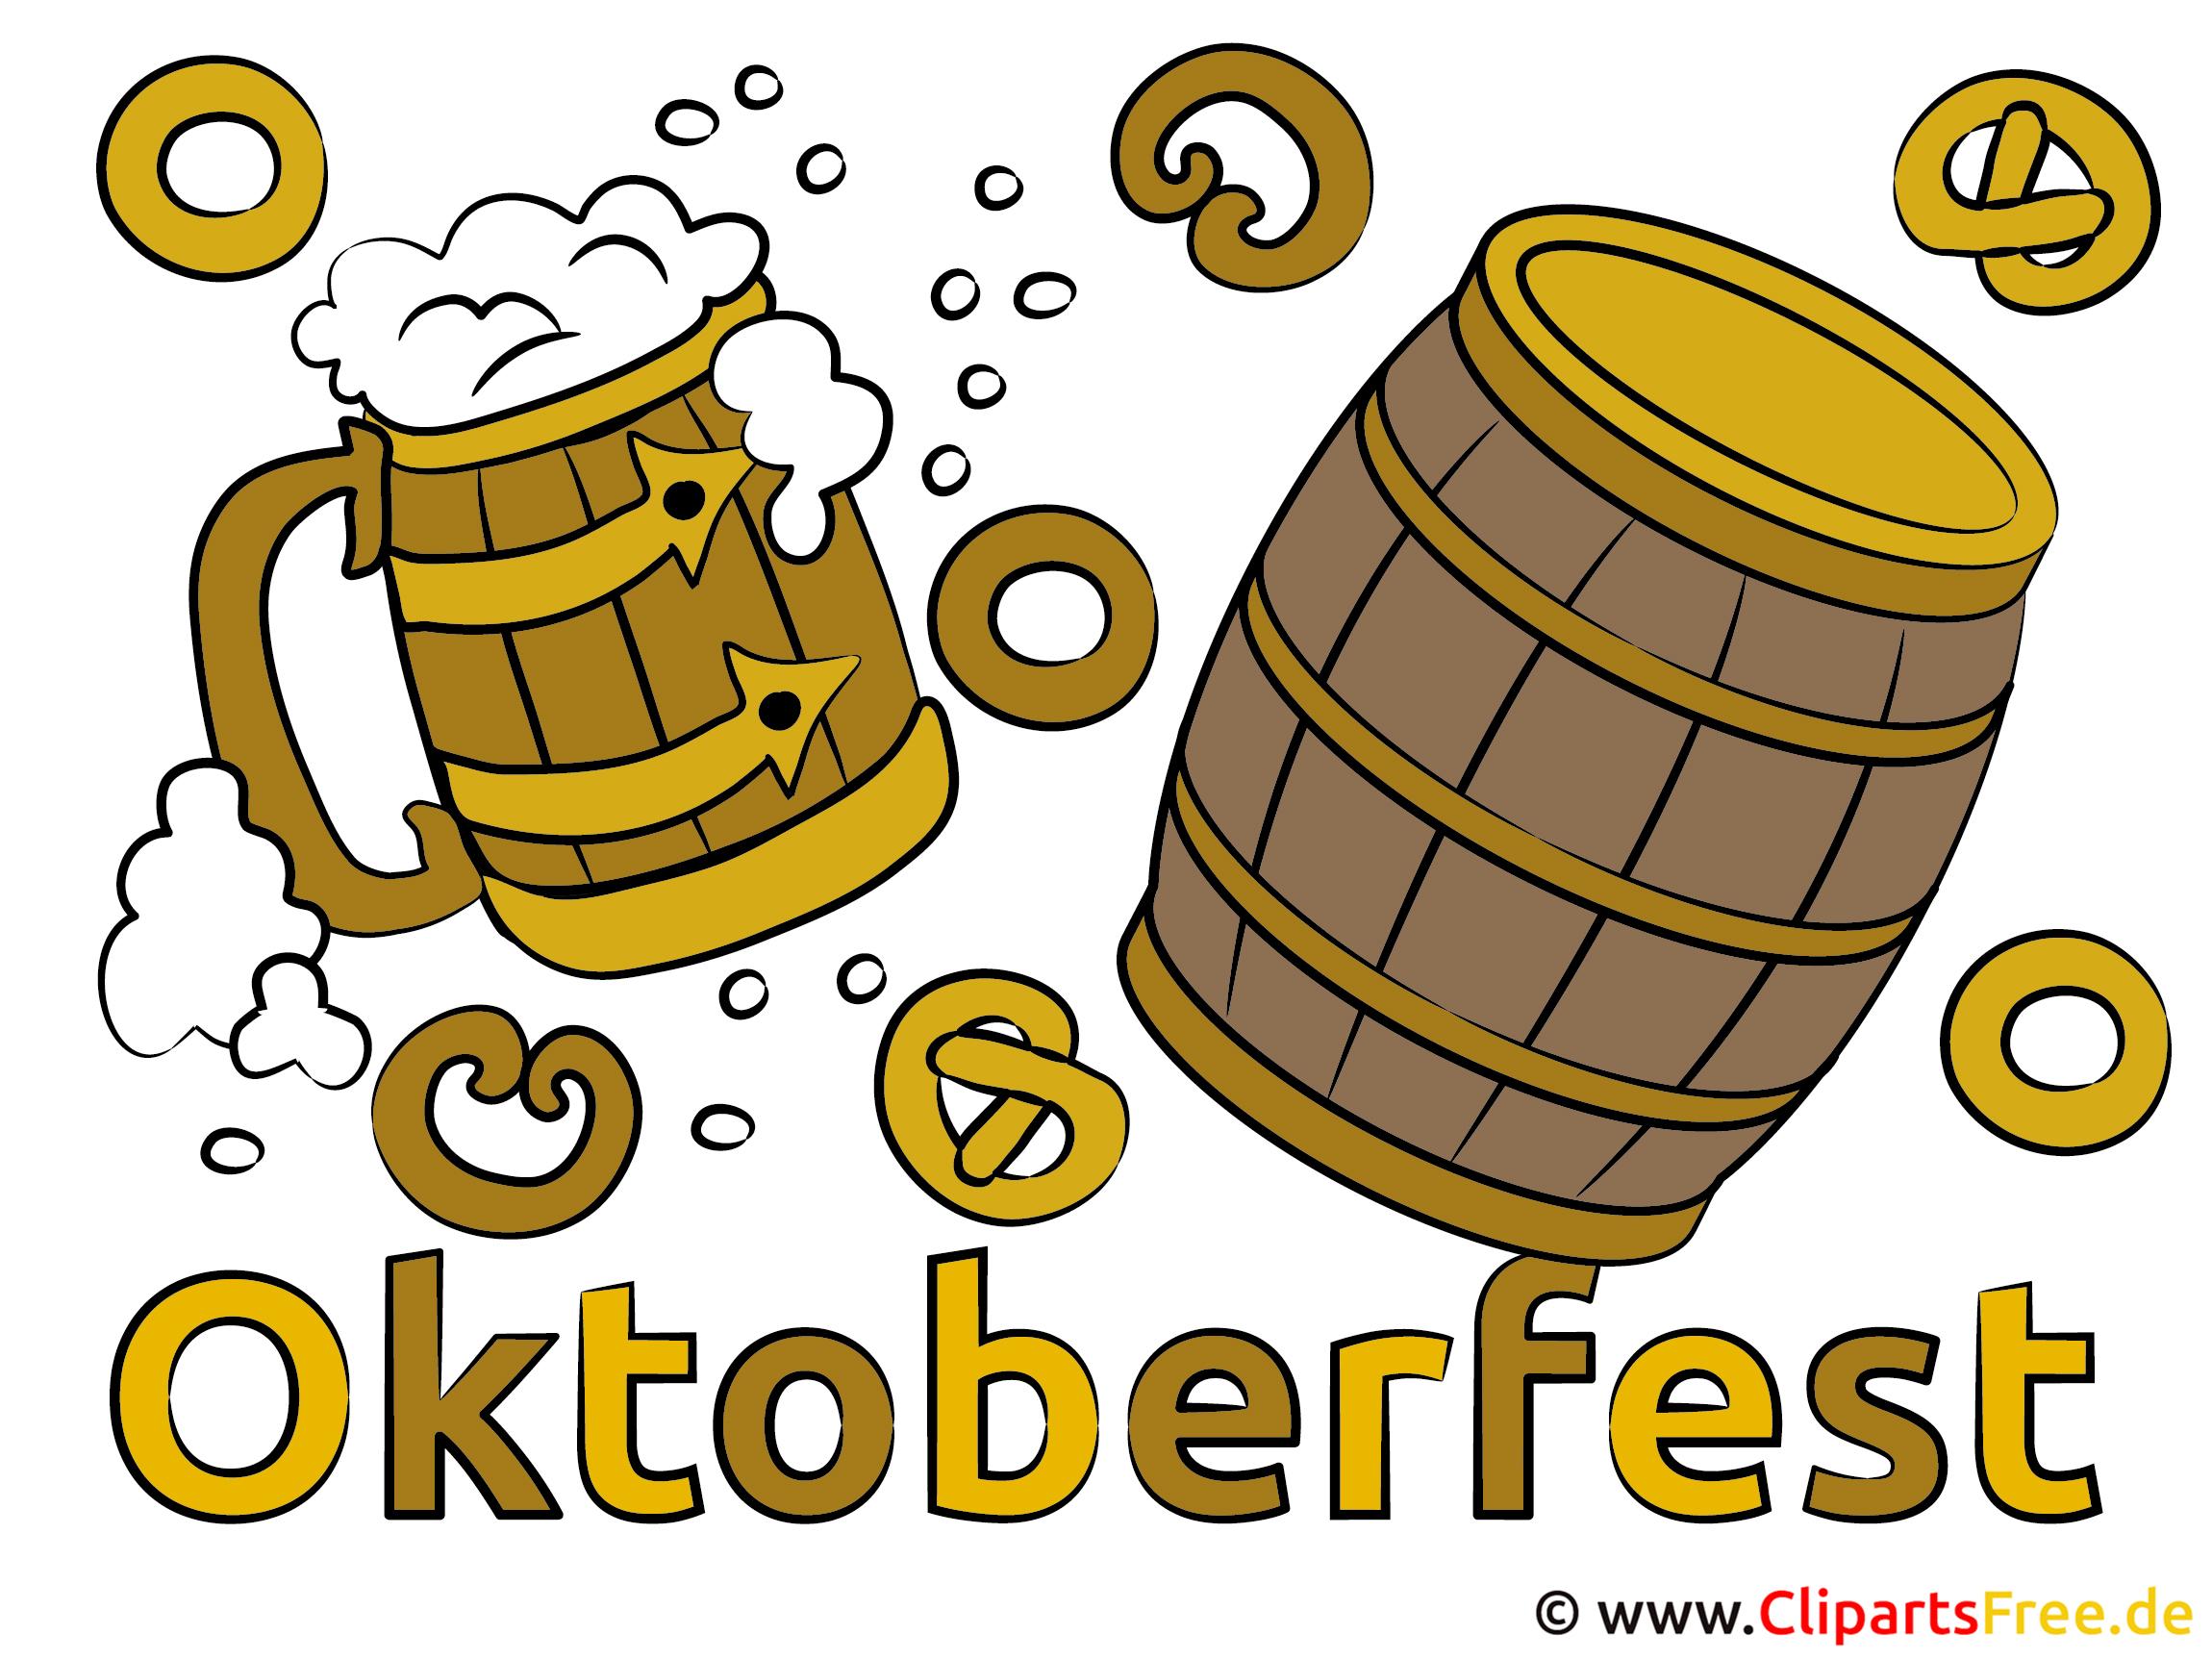 oktoberfest bilder, cliparts, cartoons, grafiken, illustrationen, Einladung